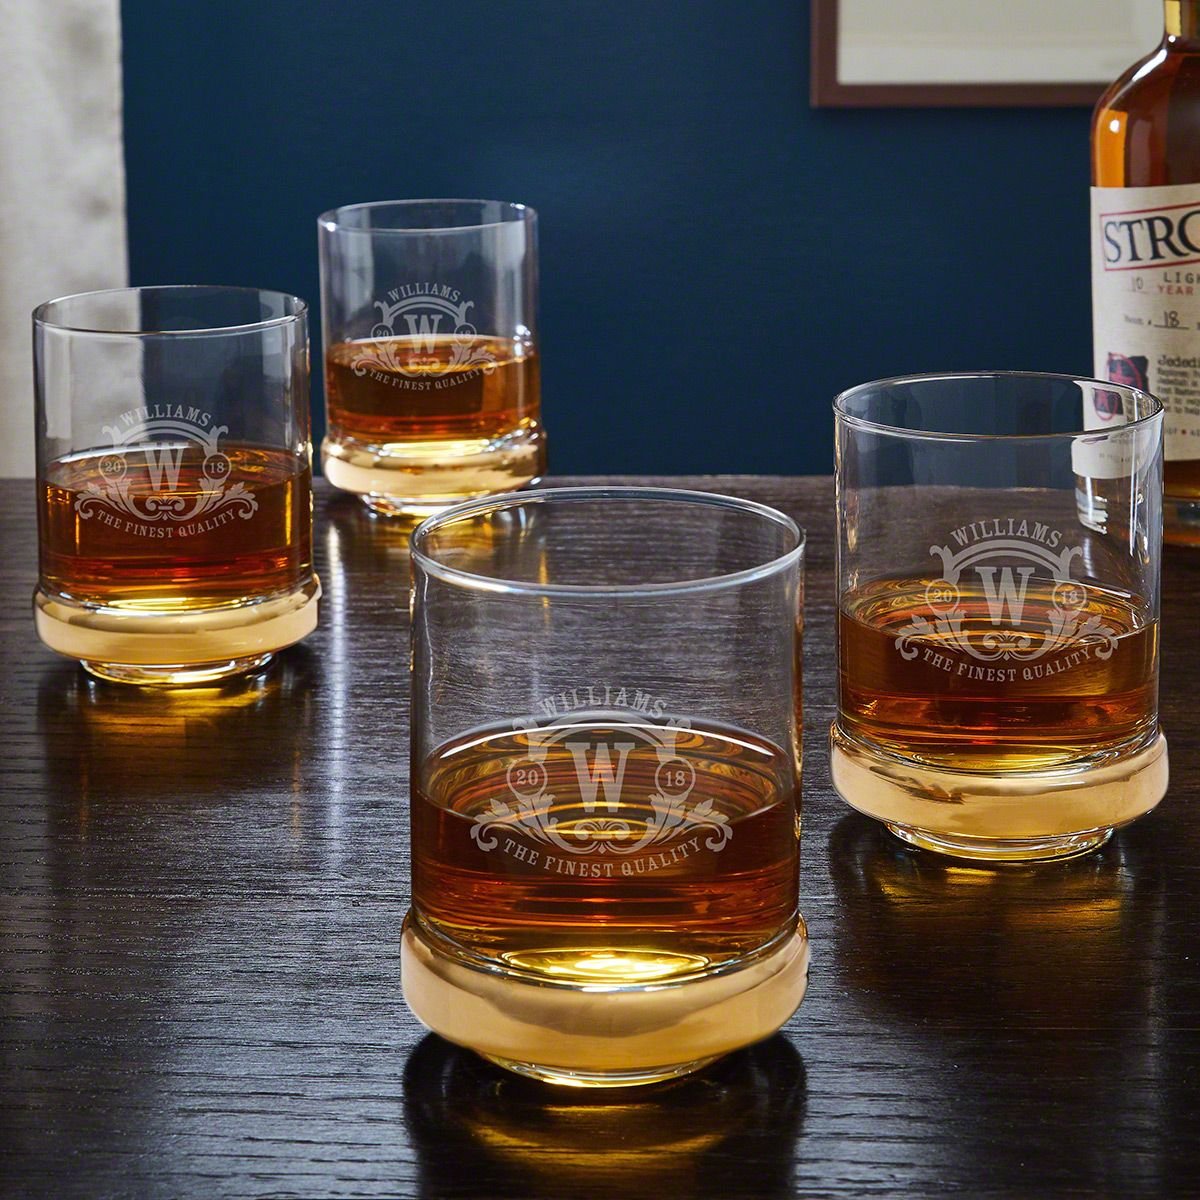 Gold Band Westbrook Monogrammed Whiskey Glasses Set of 4